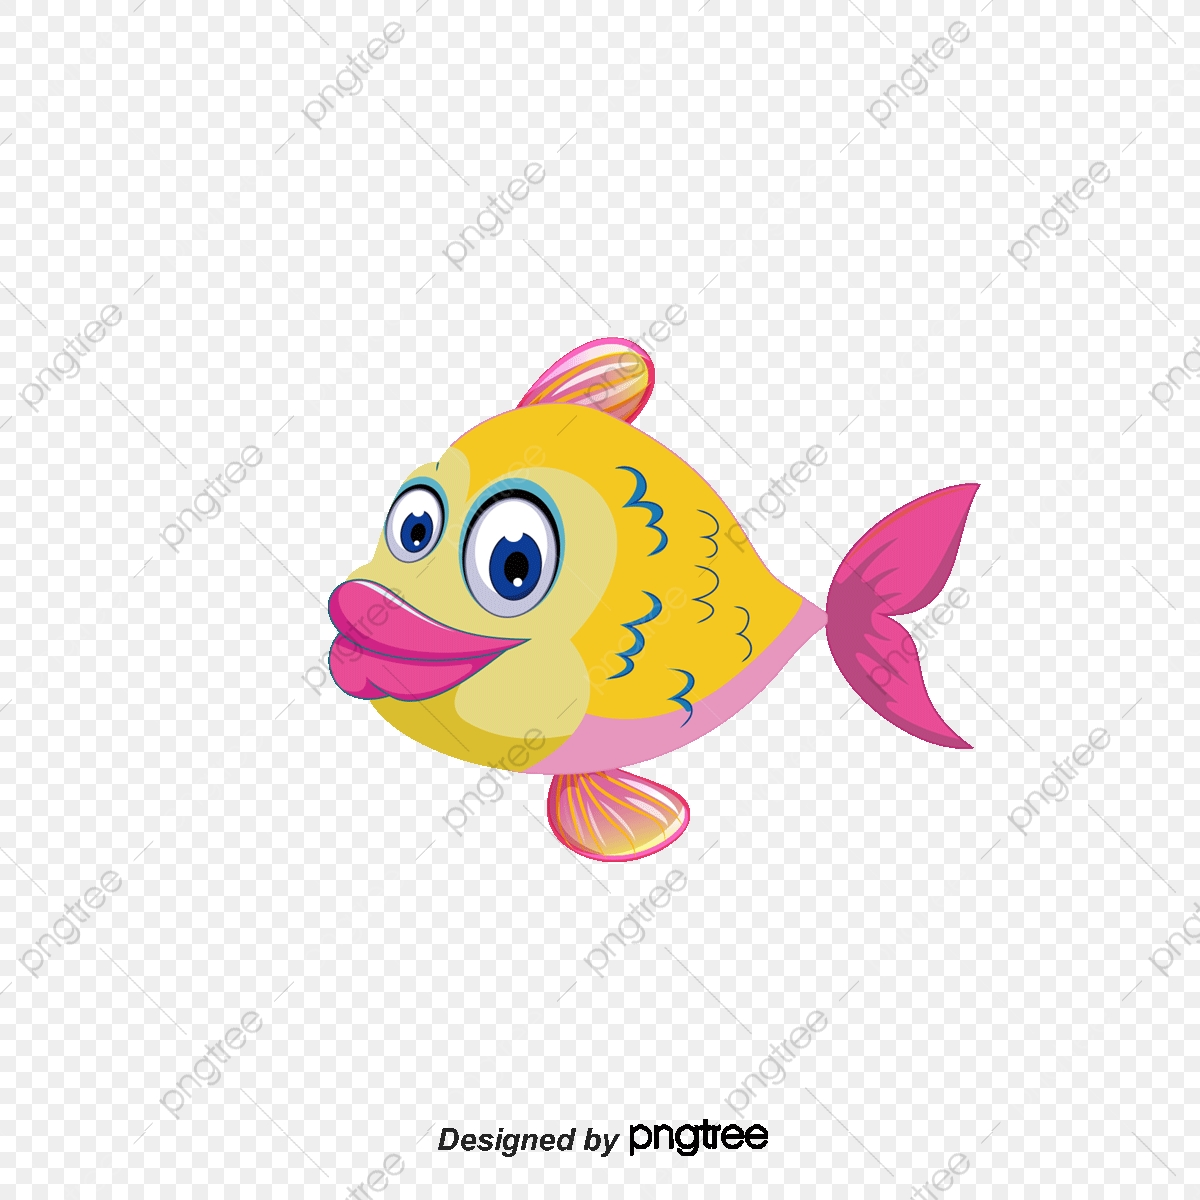 Desenho Colorido De Atum Animais Pintados A Mao Peixes Dos